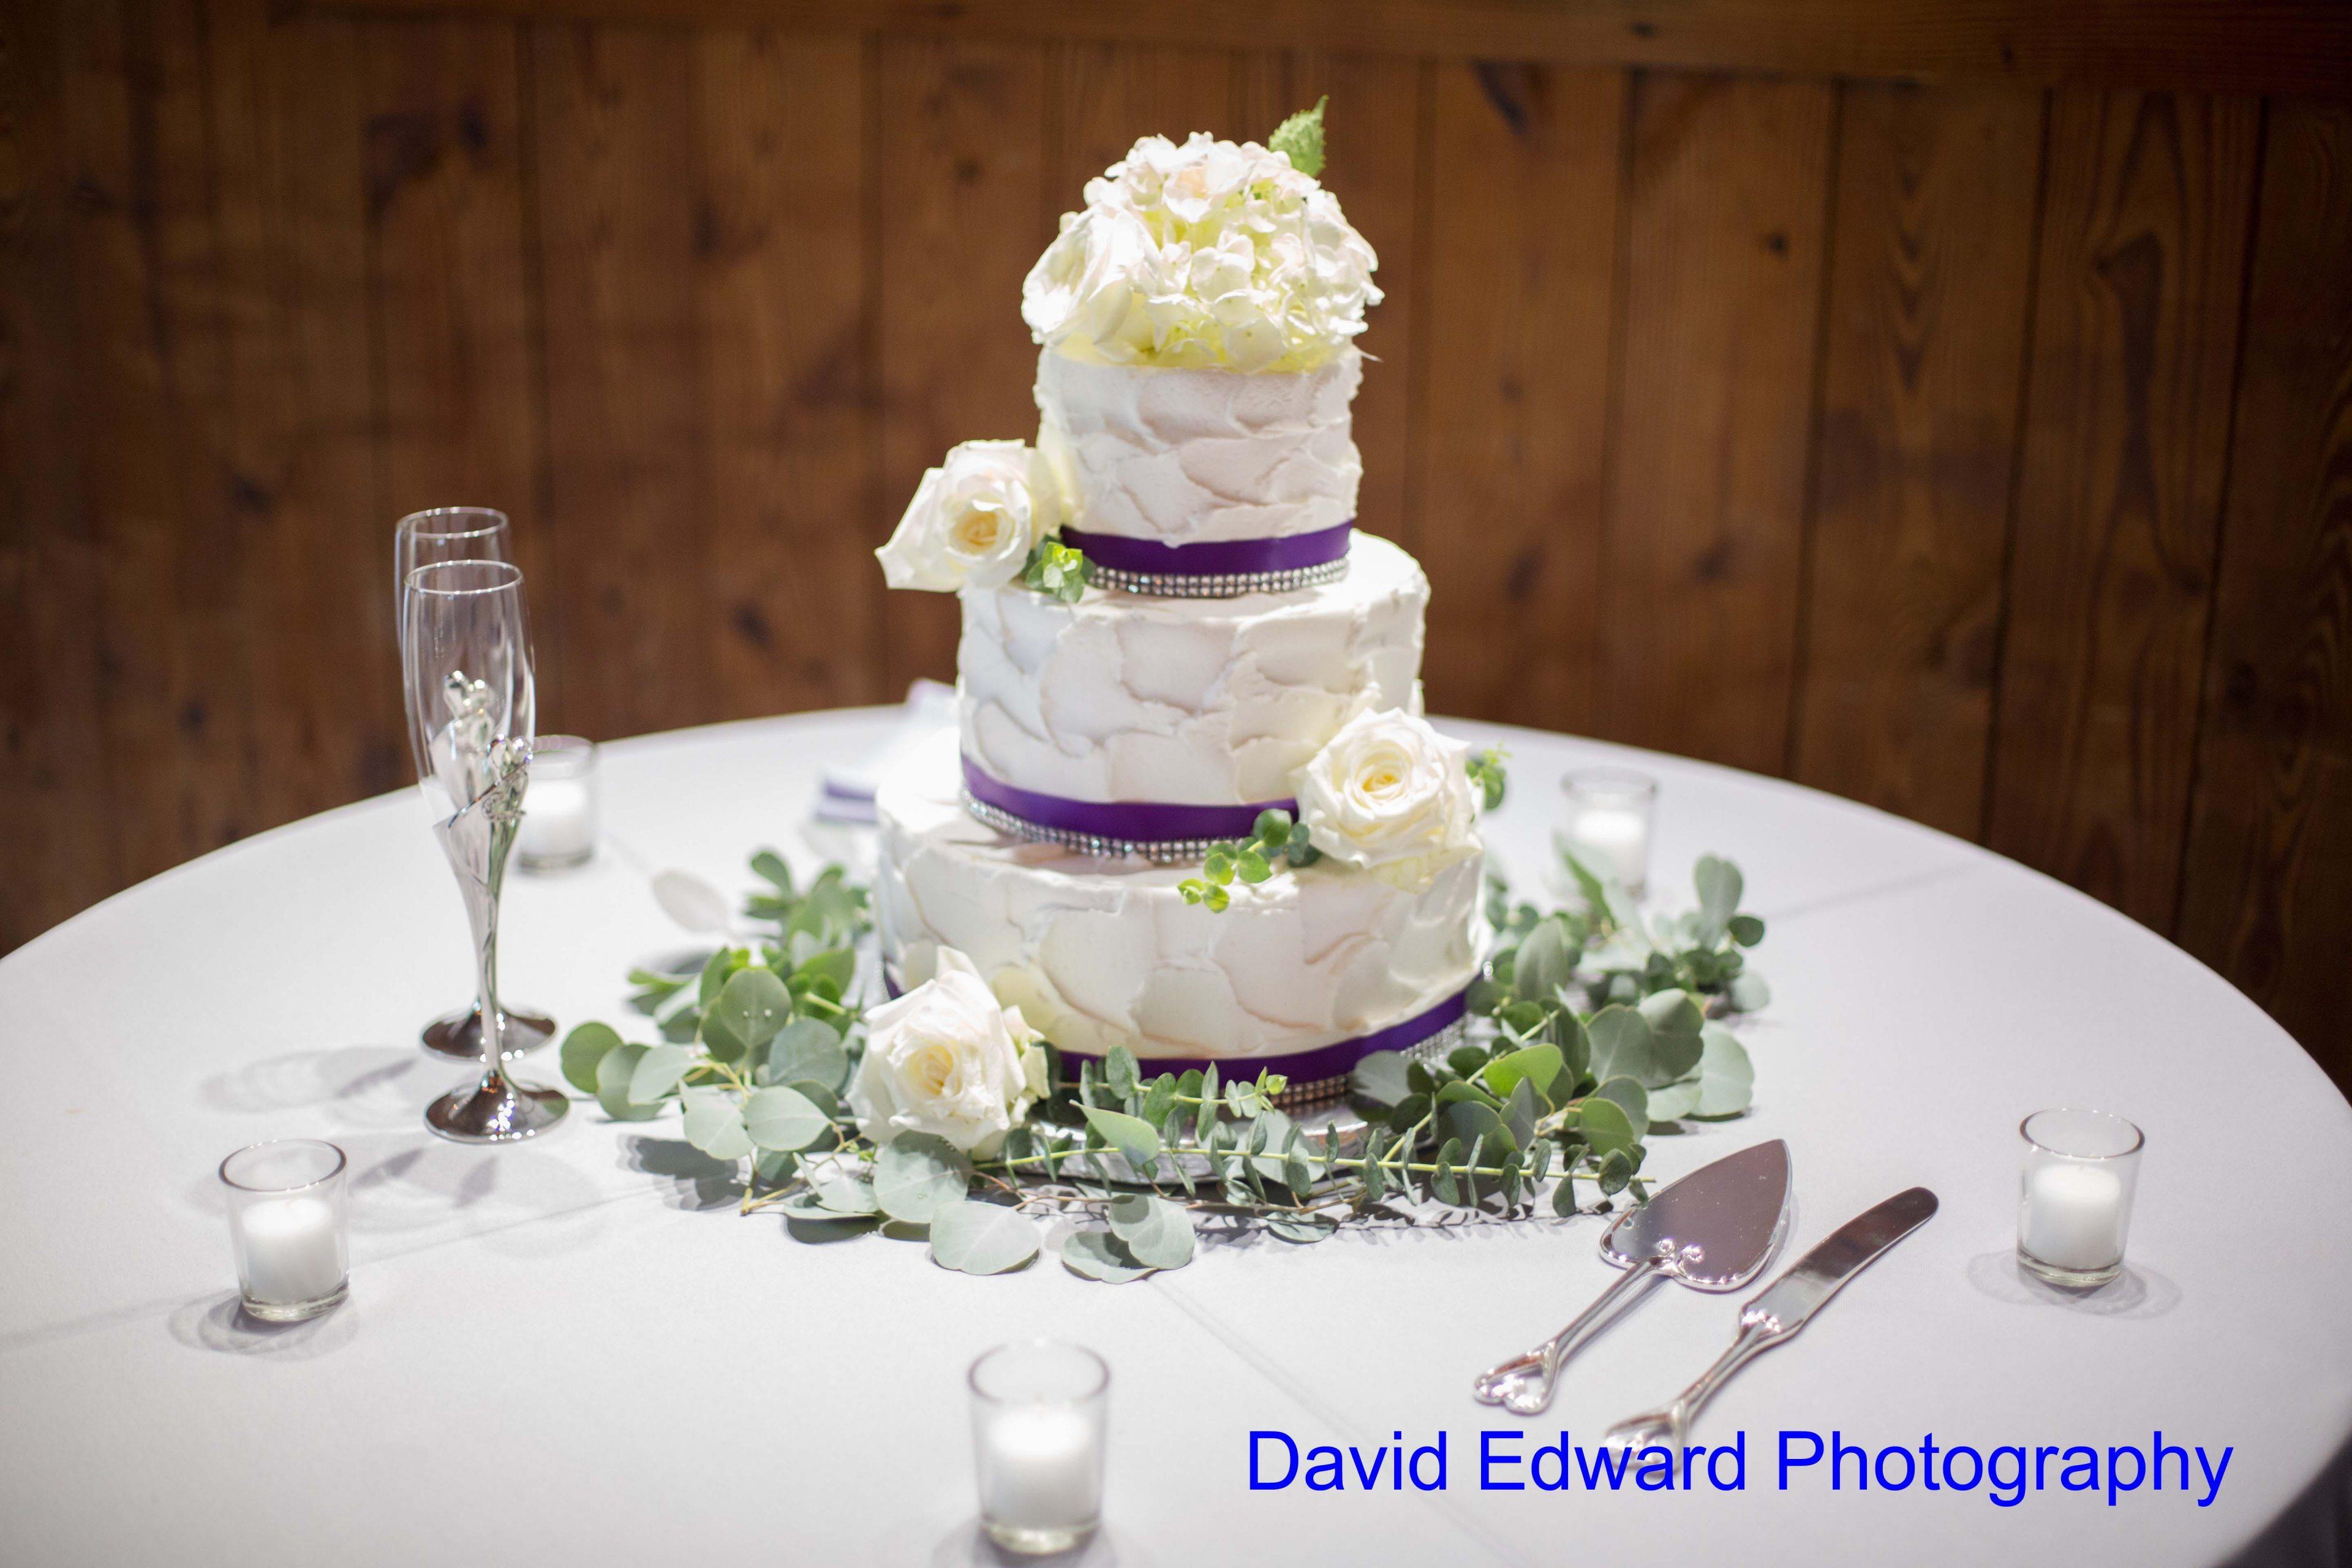 Magnificent Moments Weddings Dairy Barn David Edward Photography(4) Min